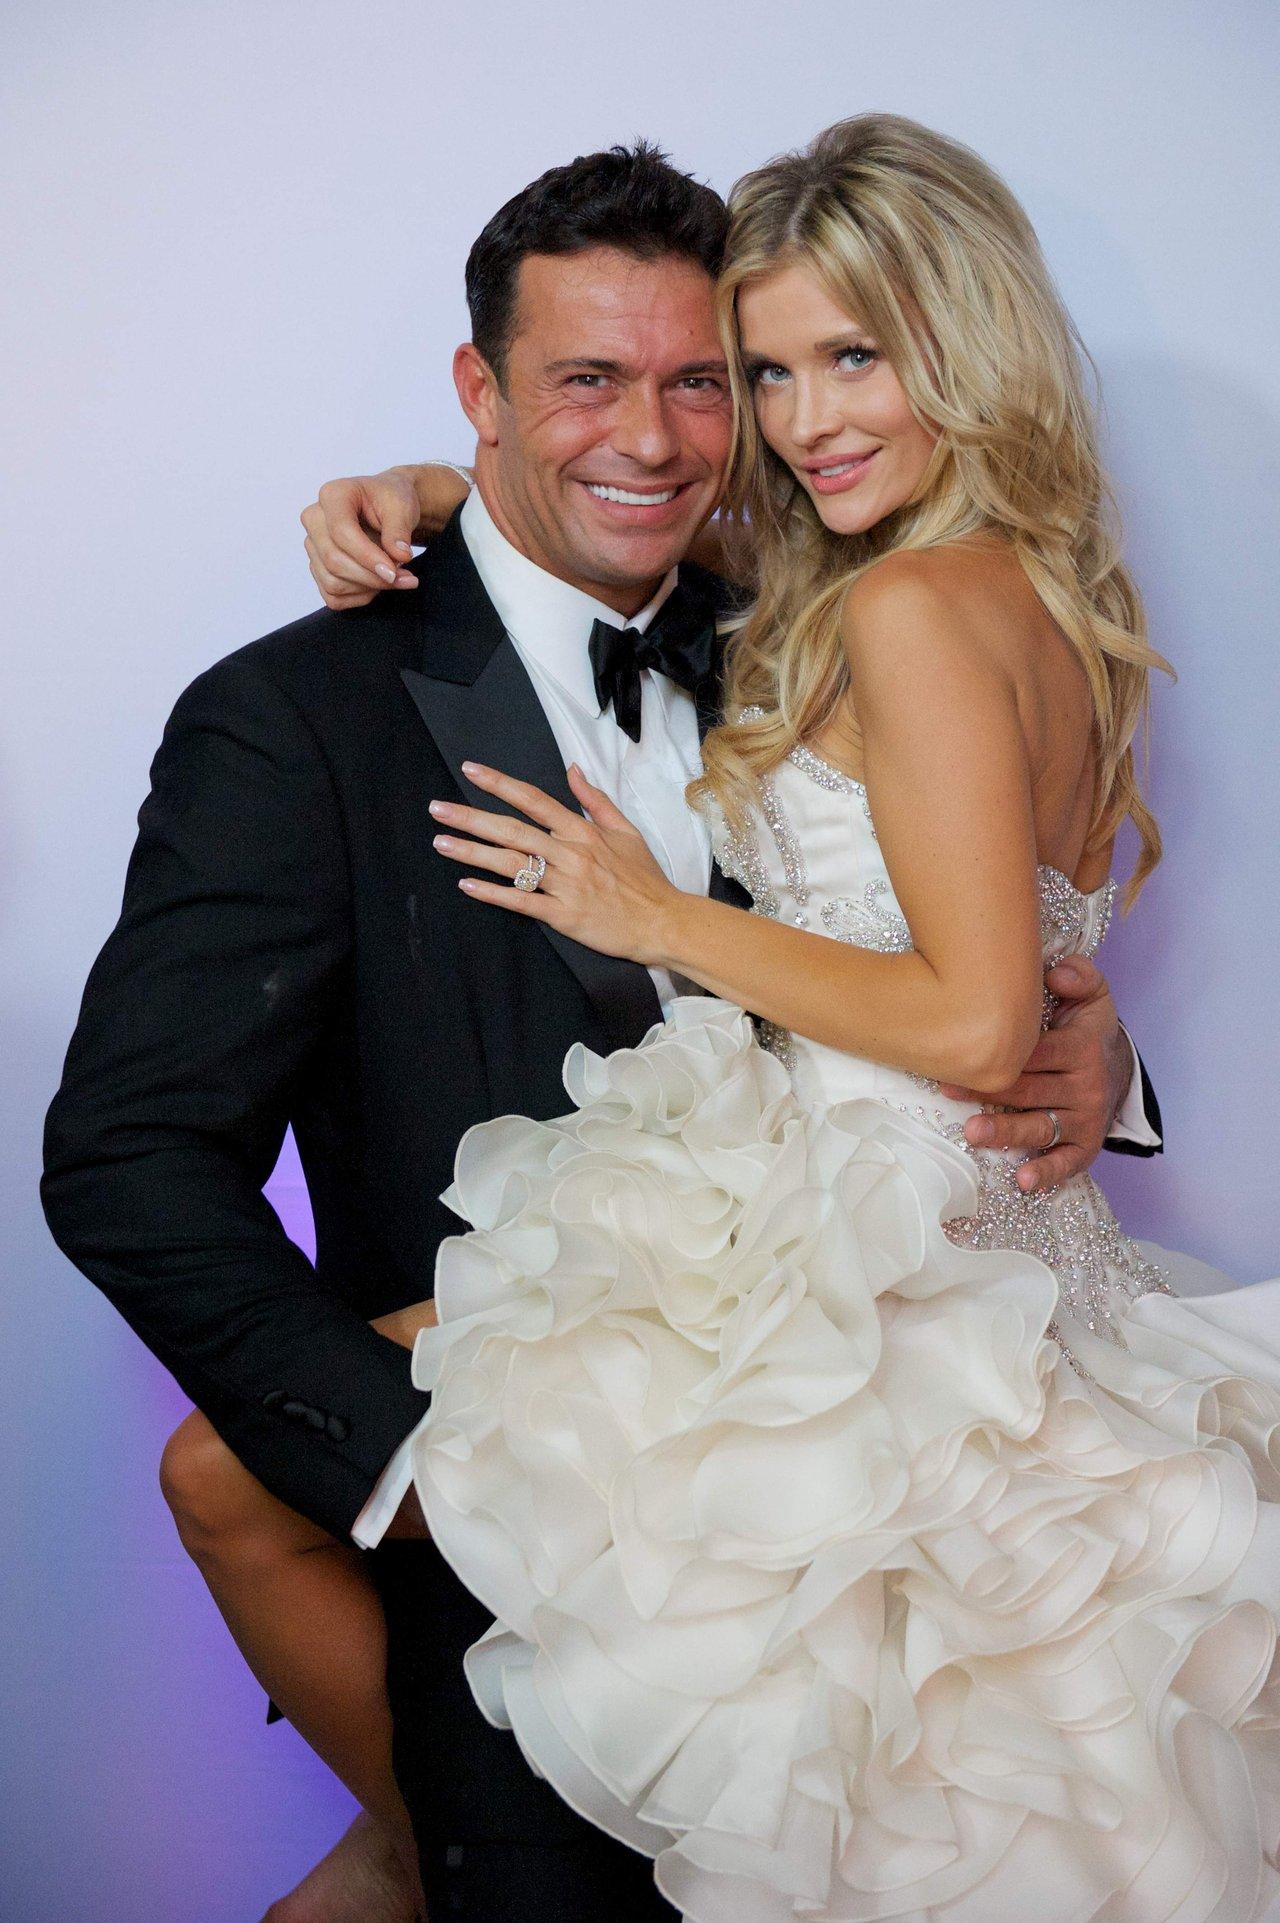 Joanna Krupa Wedding Dress